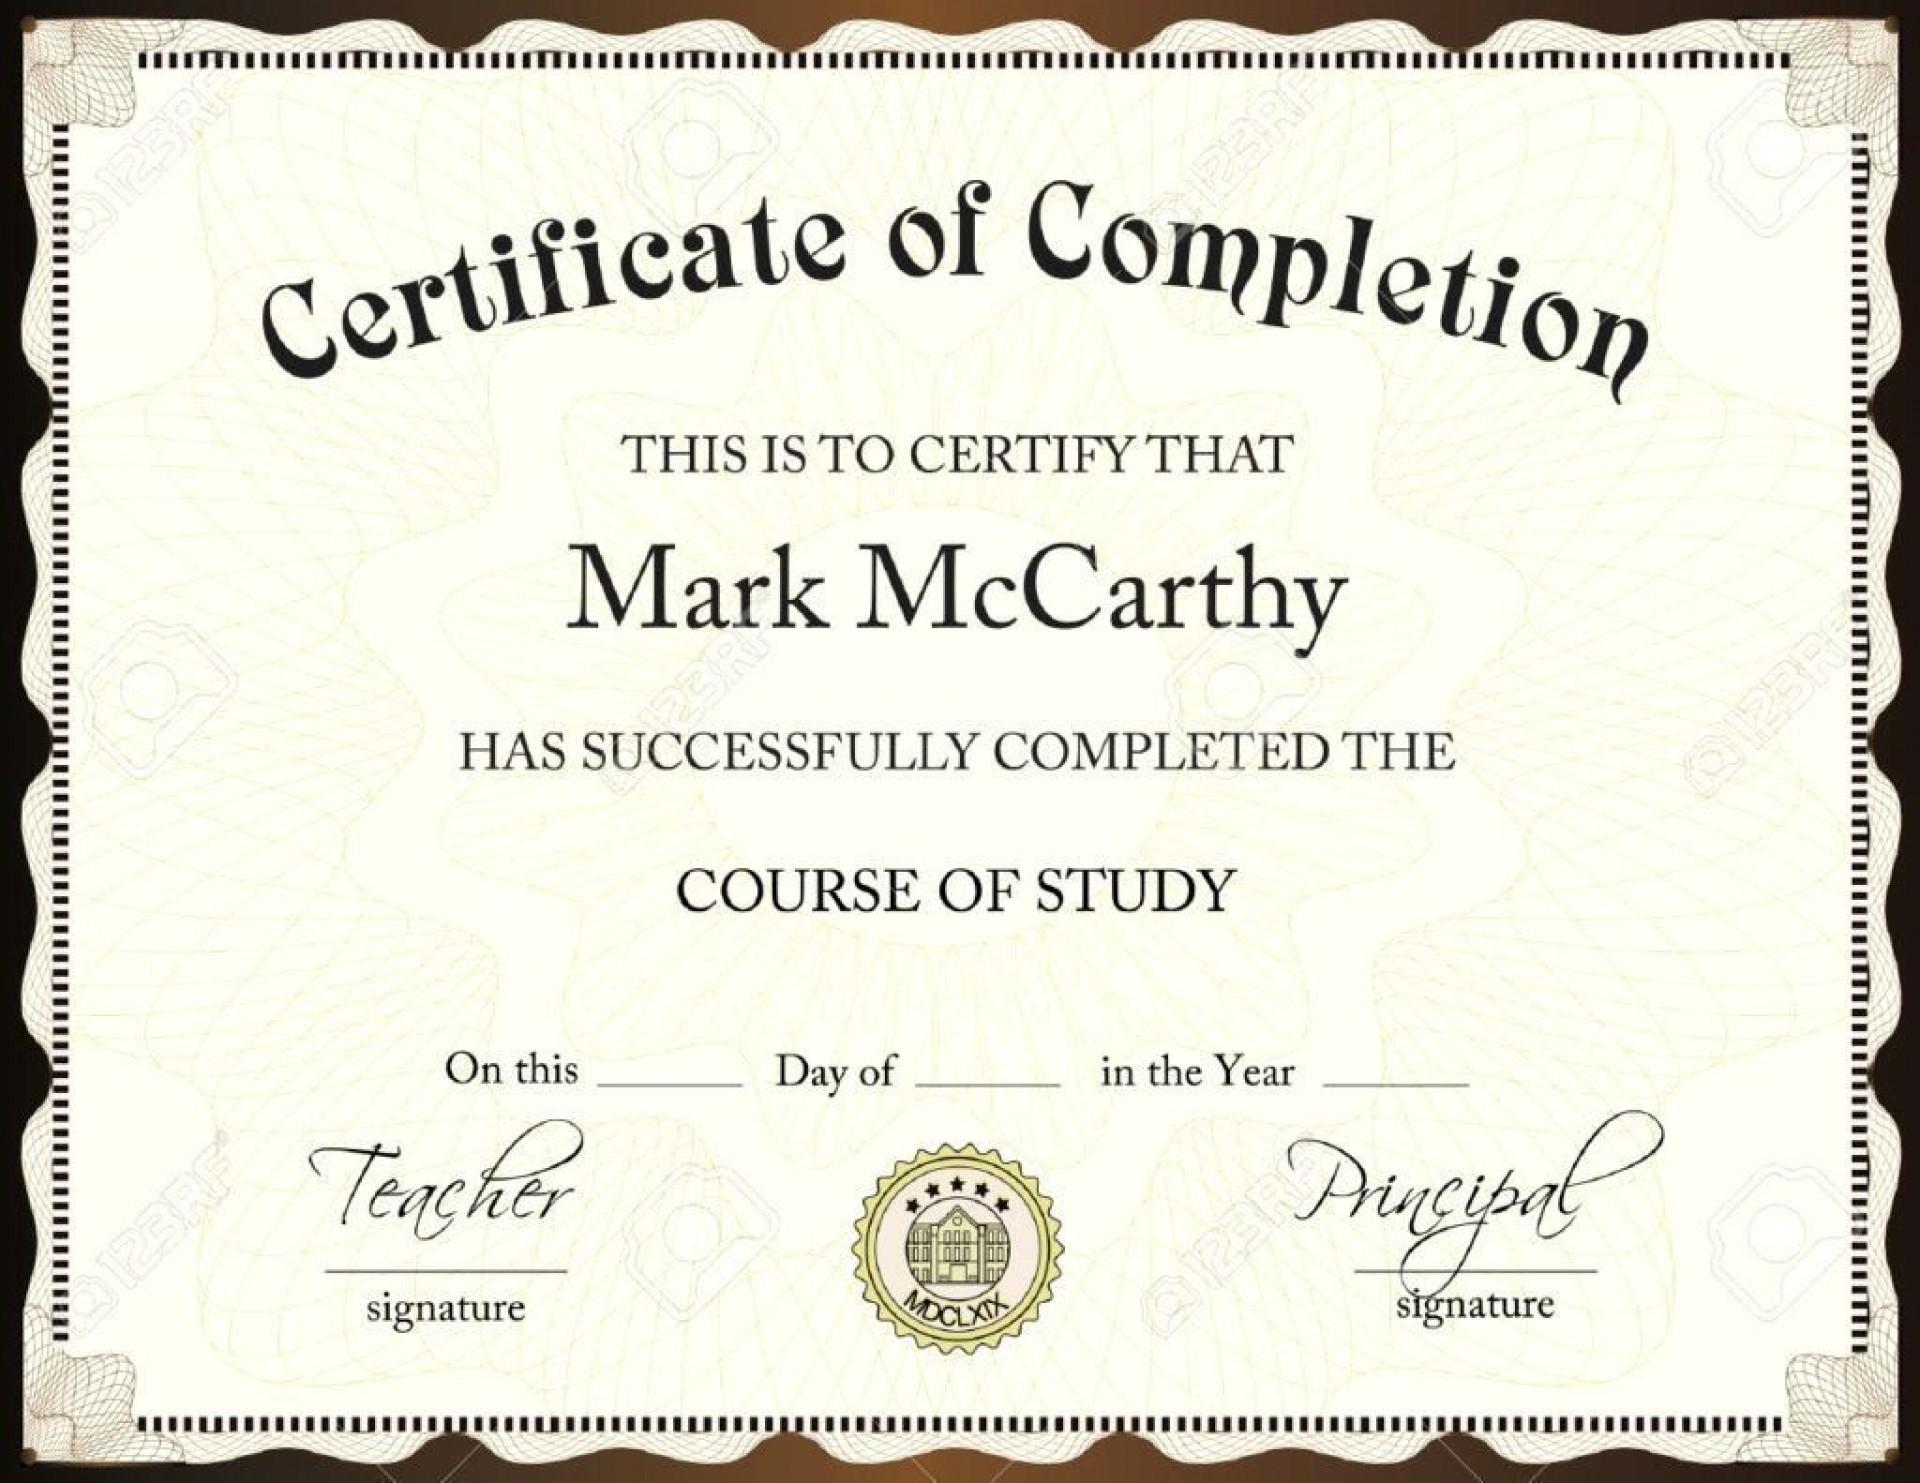 002 Impressive Degree Certificate Template Word Photo 1920